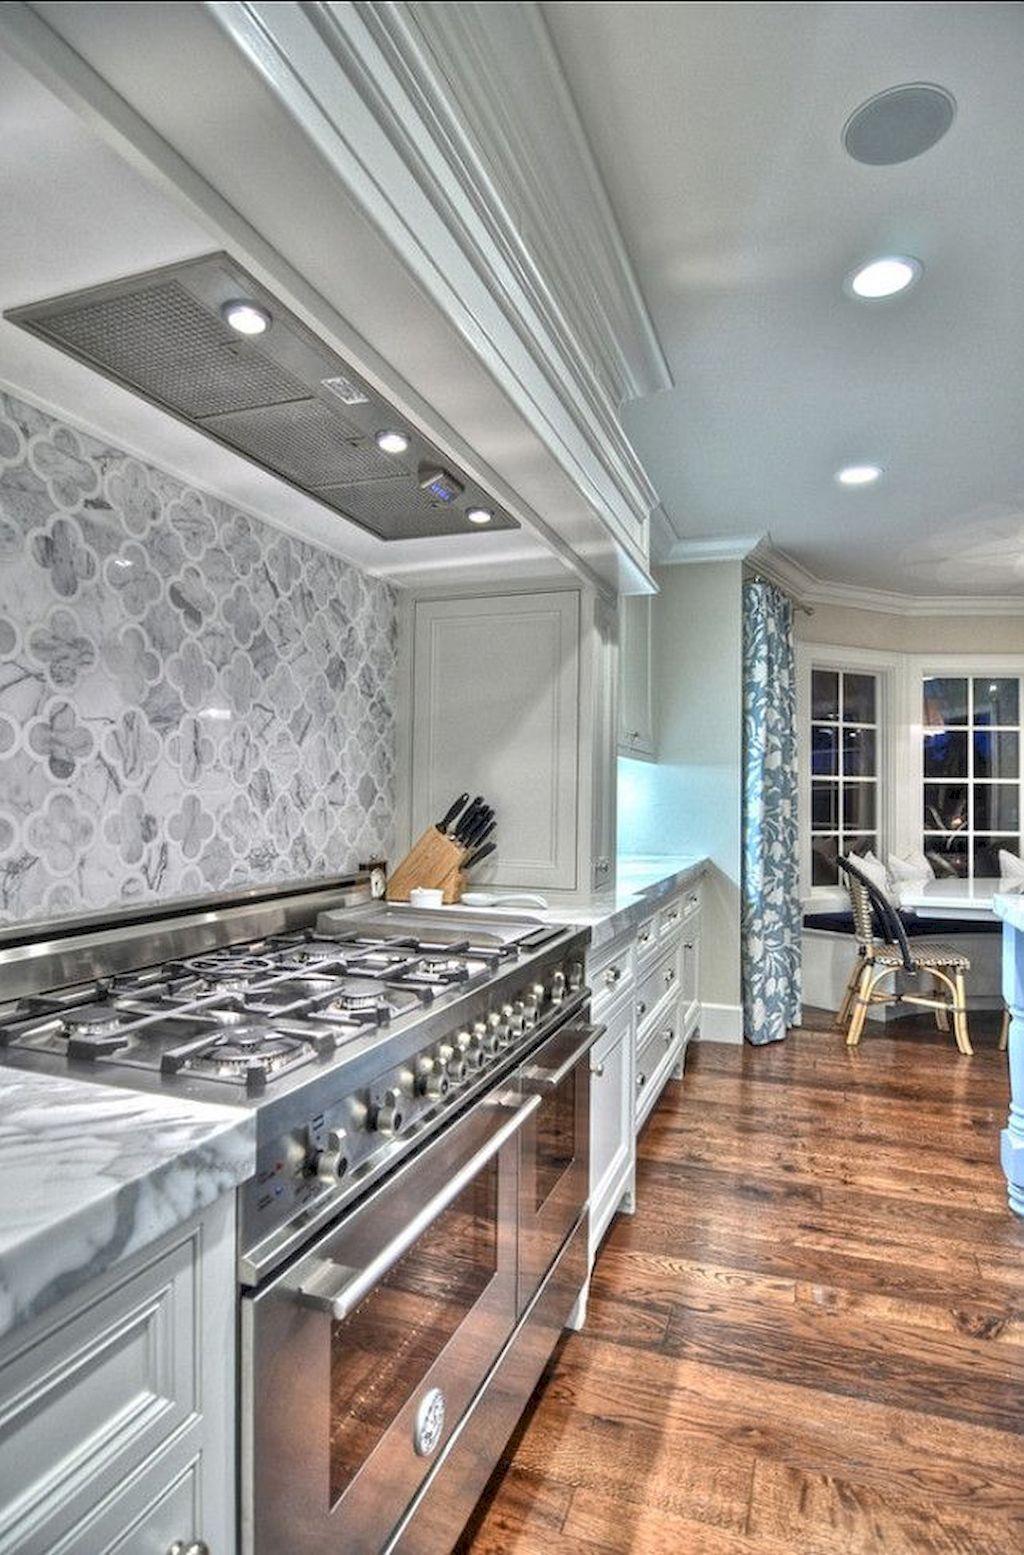 stunning kitchen backsplash ideas kitchen design kitchen decor elegant kitchens home decor on kitchen ideas elegant id=24086